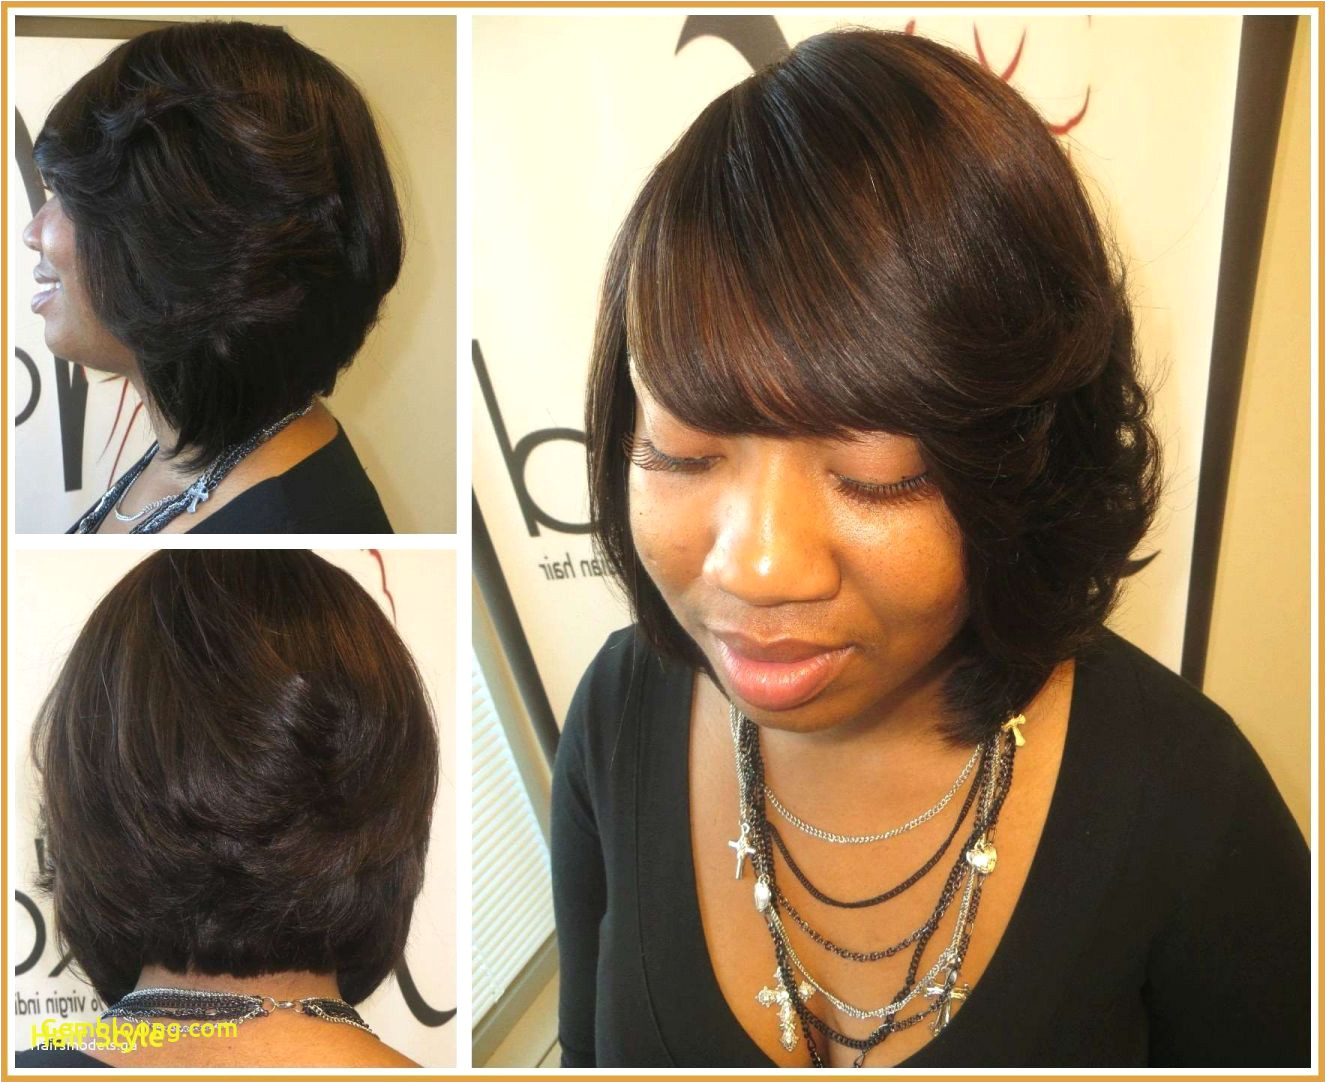 Black Bob Hairstyles Quick Weave 99 Un Mon Quick Weave Short Bob Hairstyles ⚡